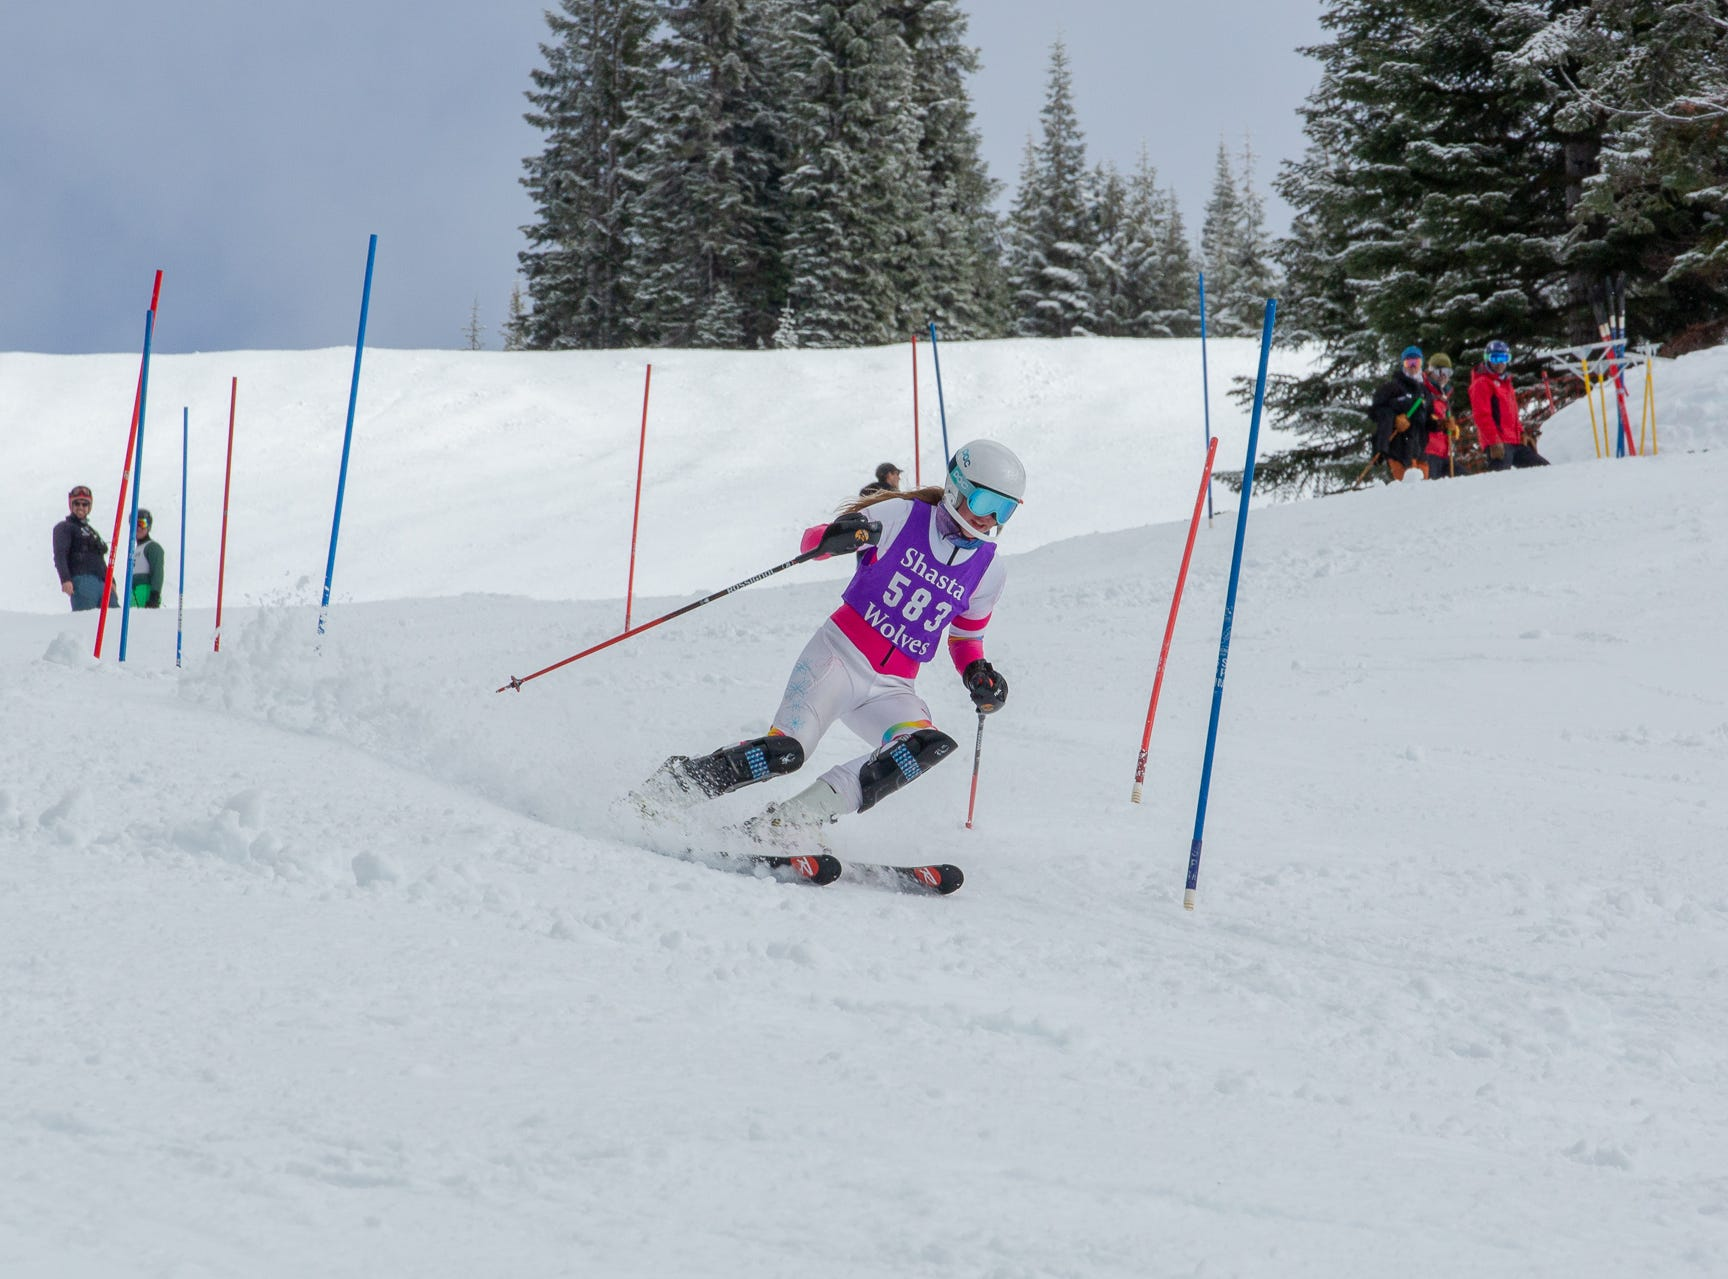 Jenna Randolph of Shasta competes in the second high school ski meet of 2019 on Monday, Jan. 21 at Mt. Shasta Ski Park.